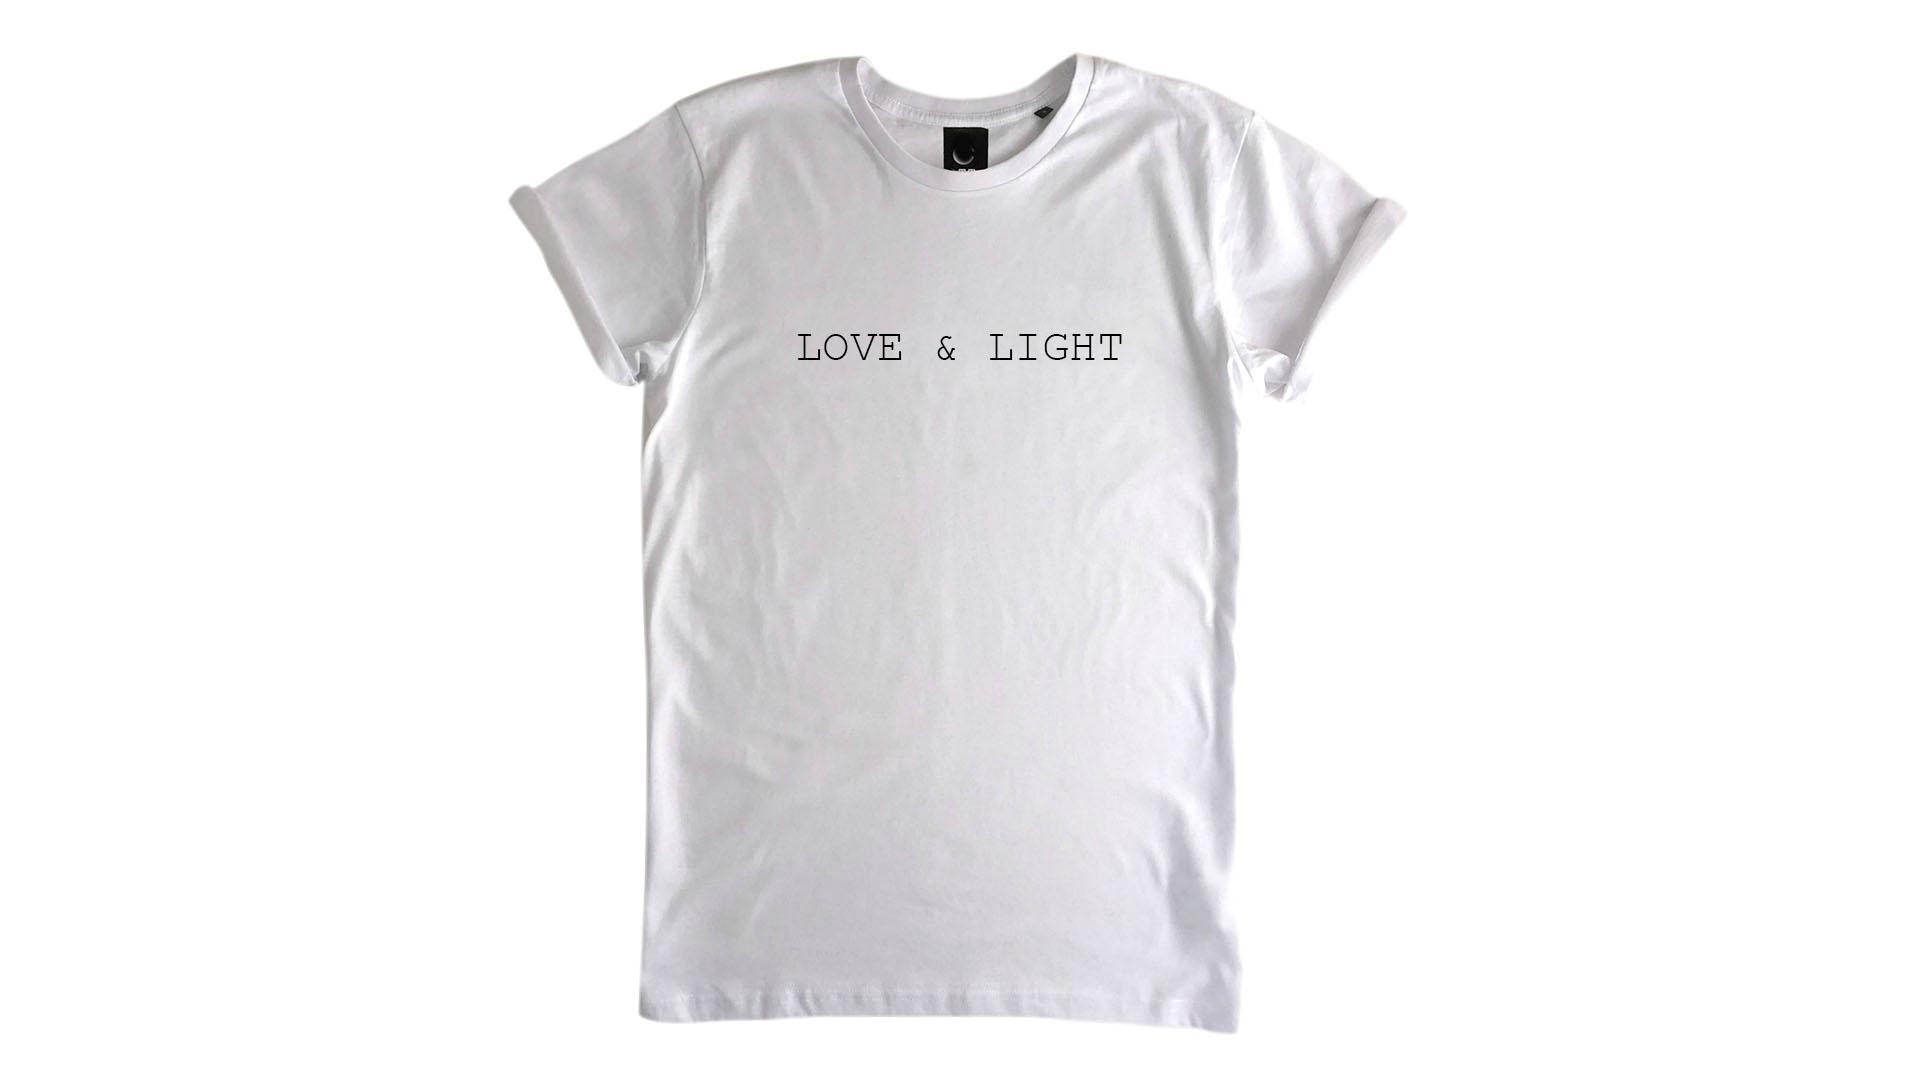 LiveLearn.Yoga Yoga T-Shirt Organic Cotton Love & Light White